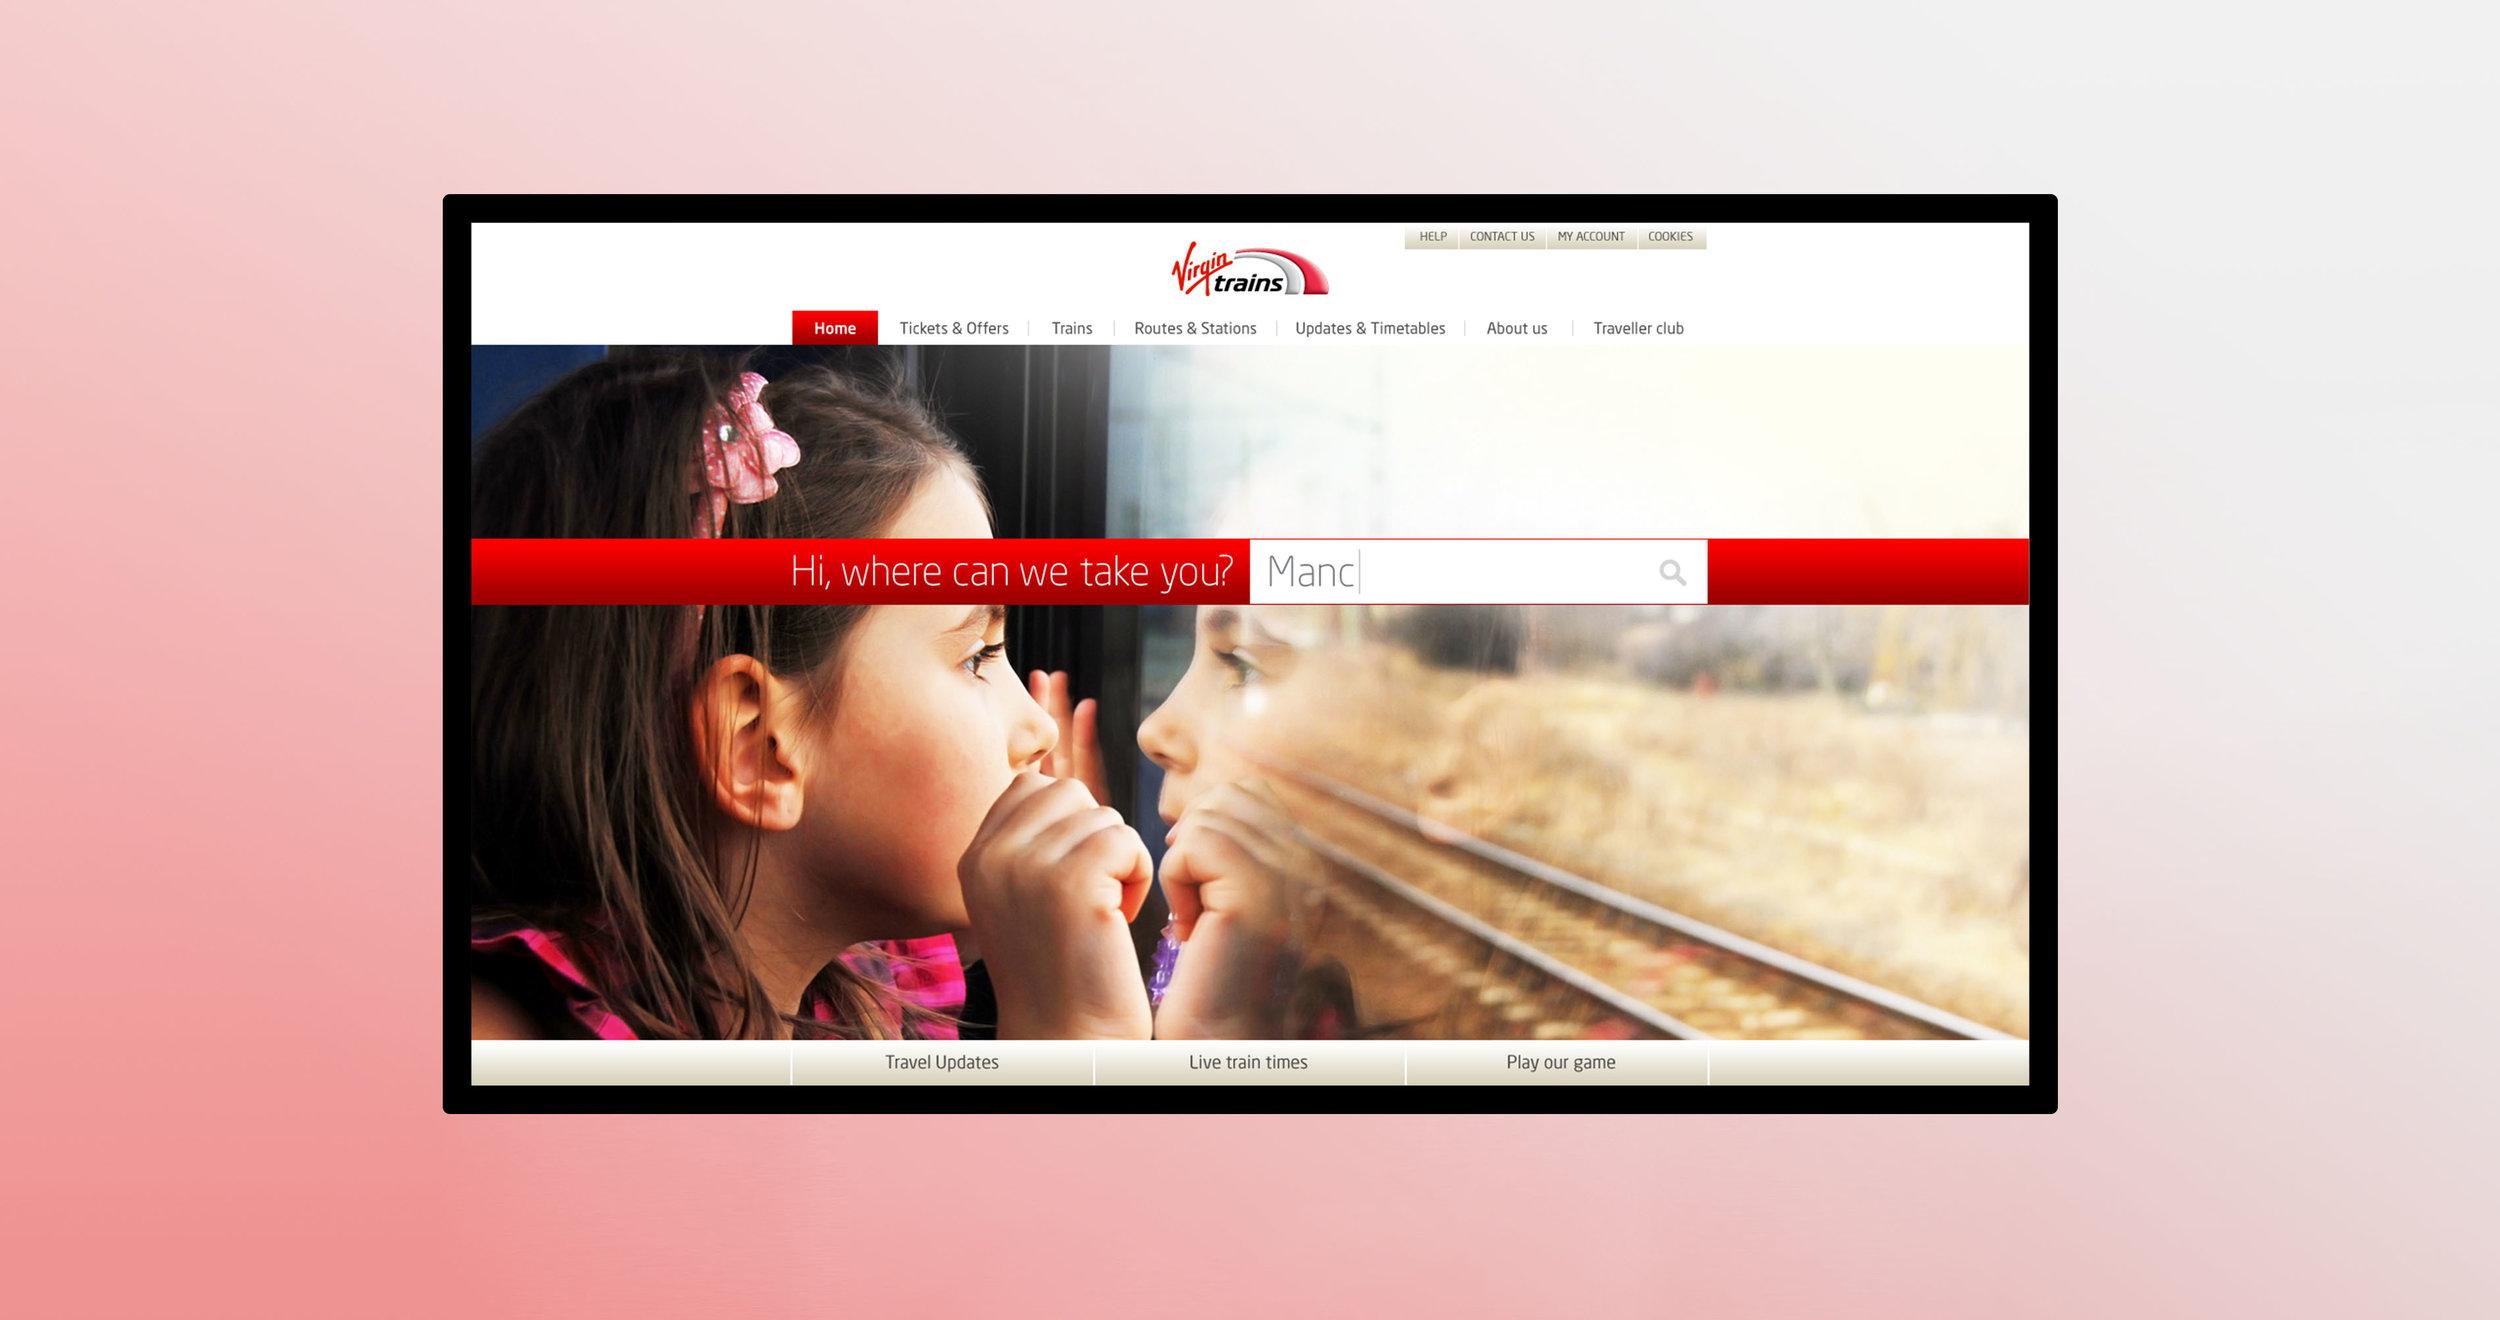 Virgin Trains website 1.jpg